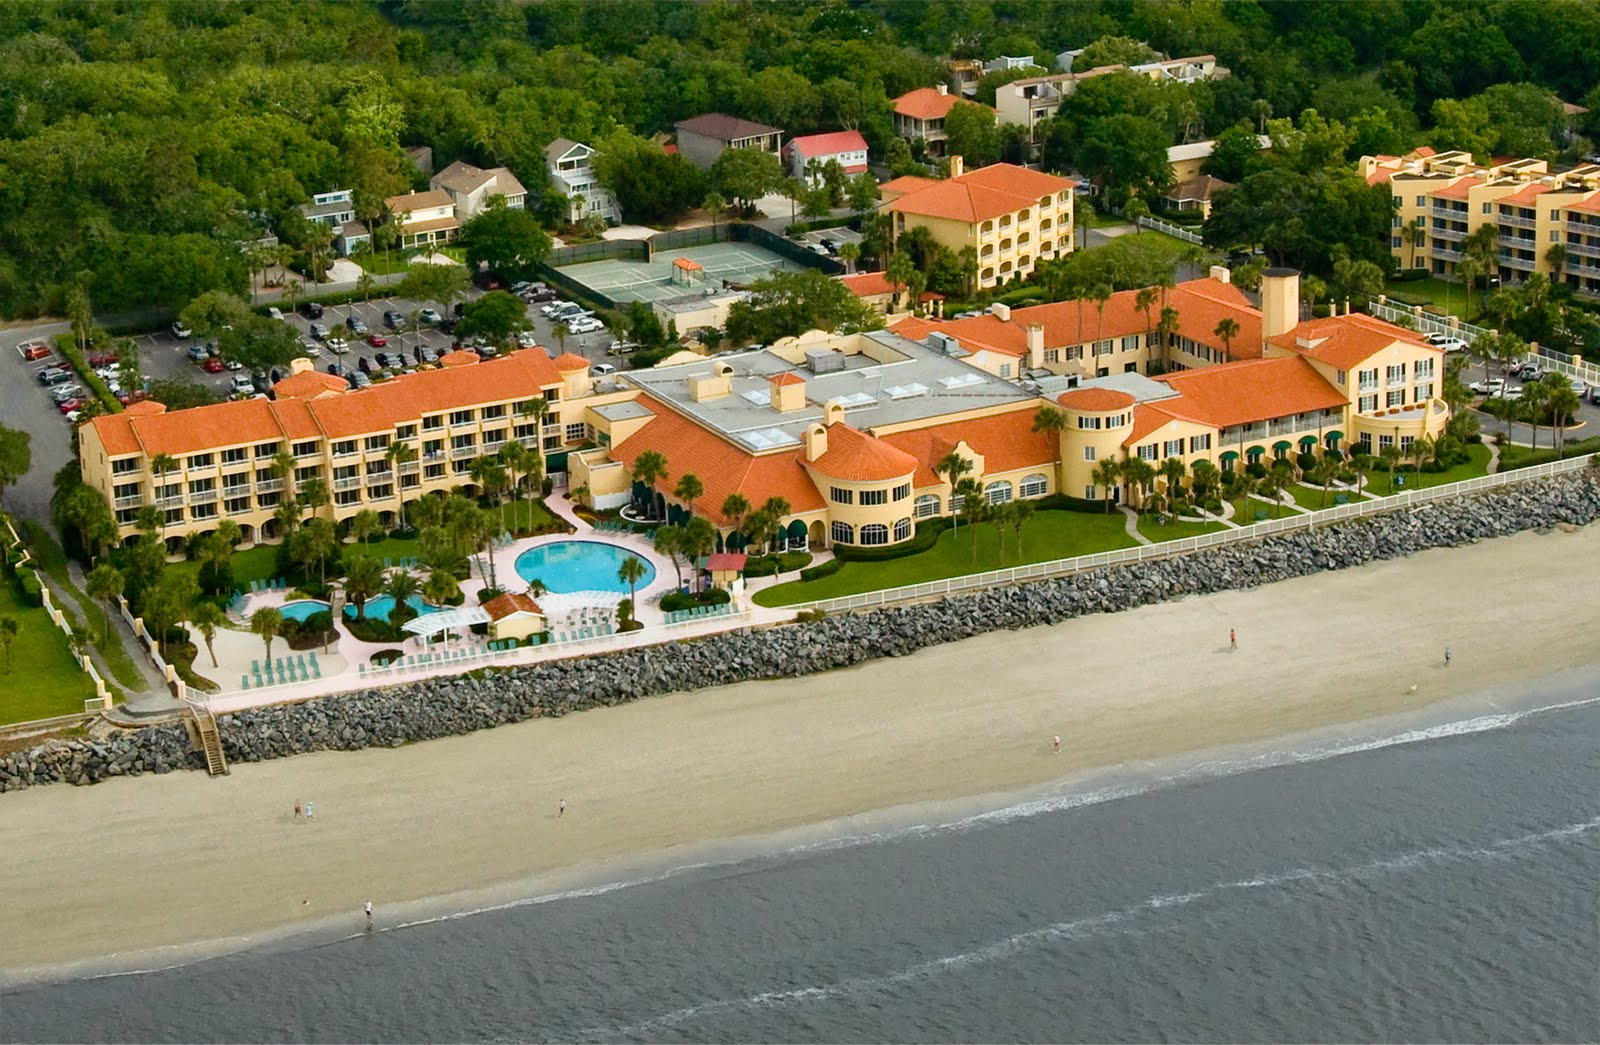 Hy Birthday St Simons Island Hotel